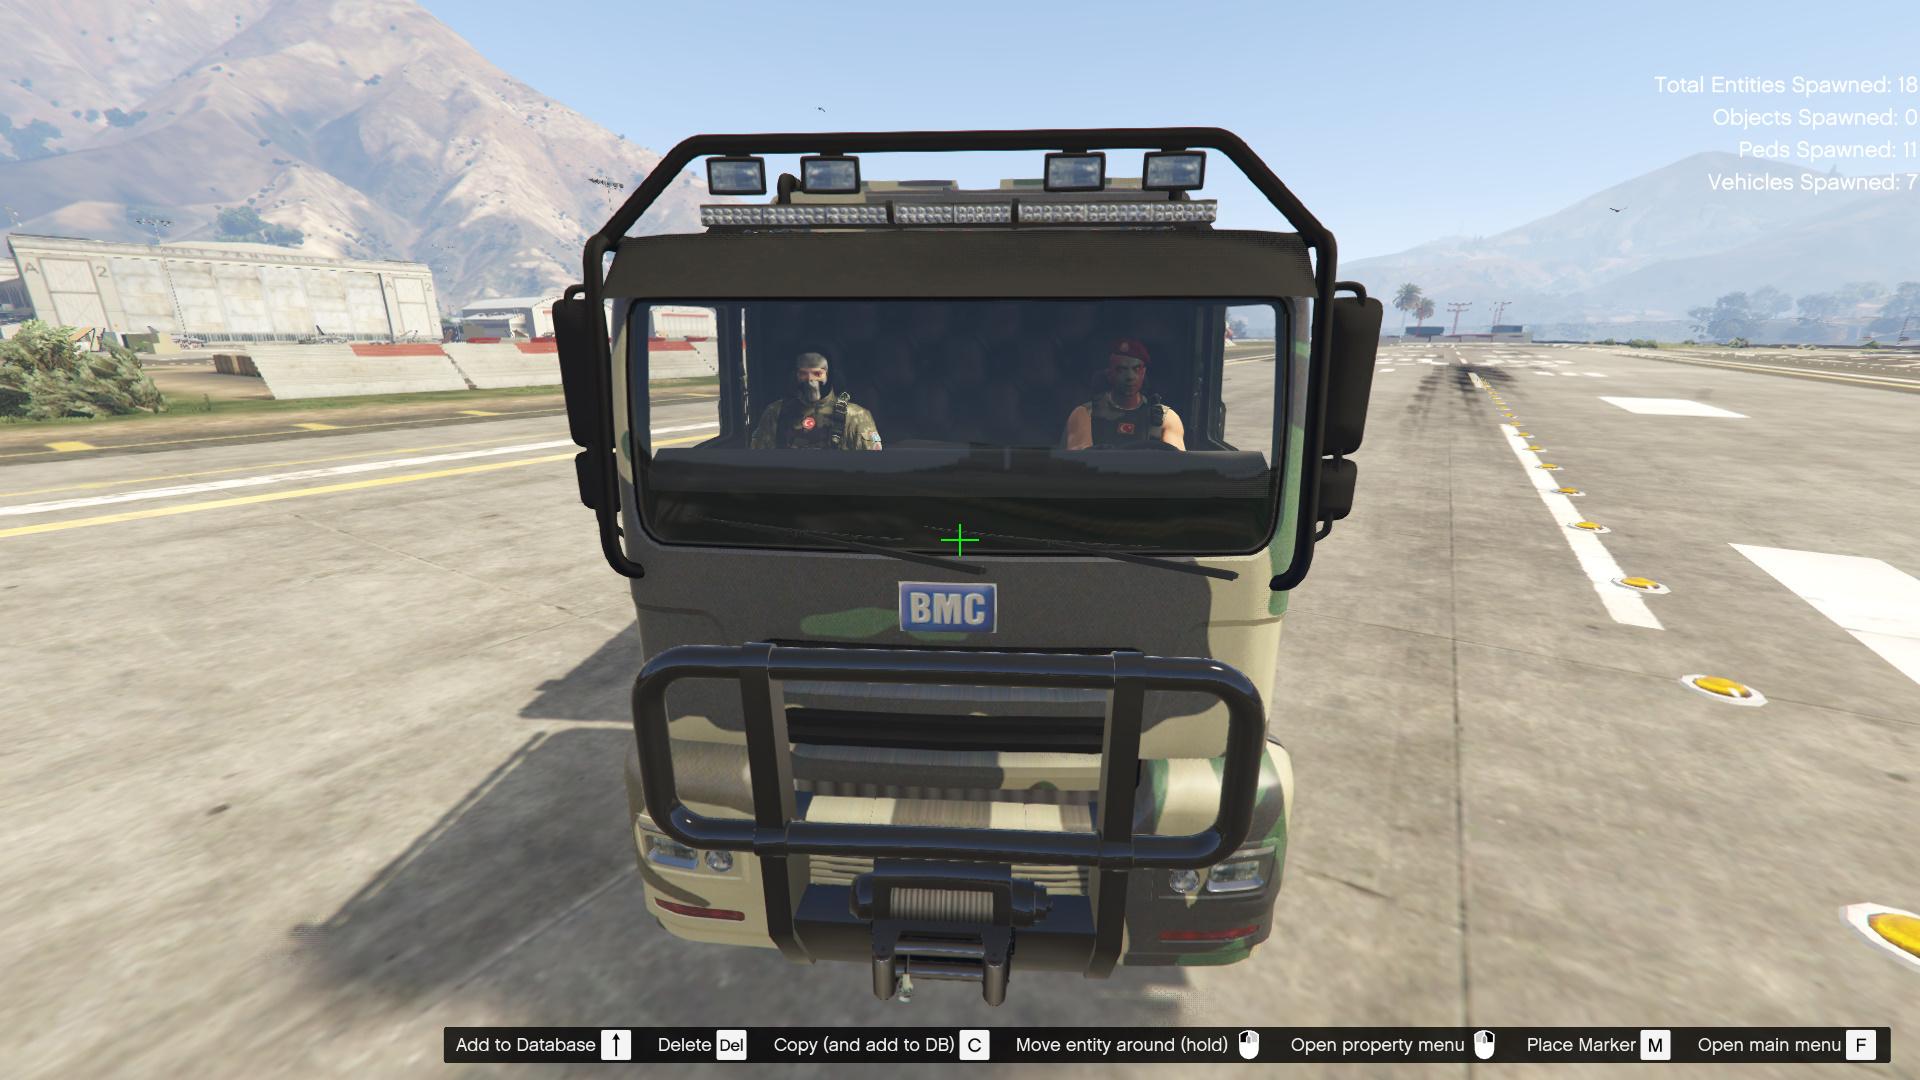 S K bmc t s k camion gta5 mods com